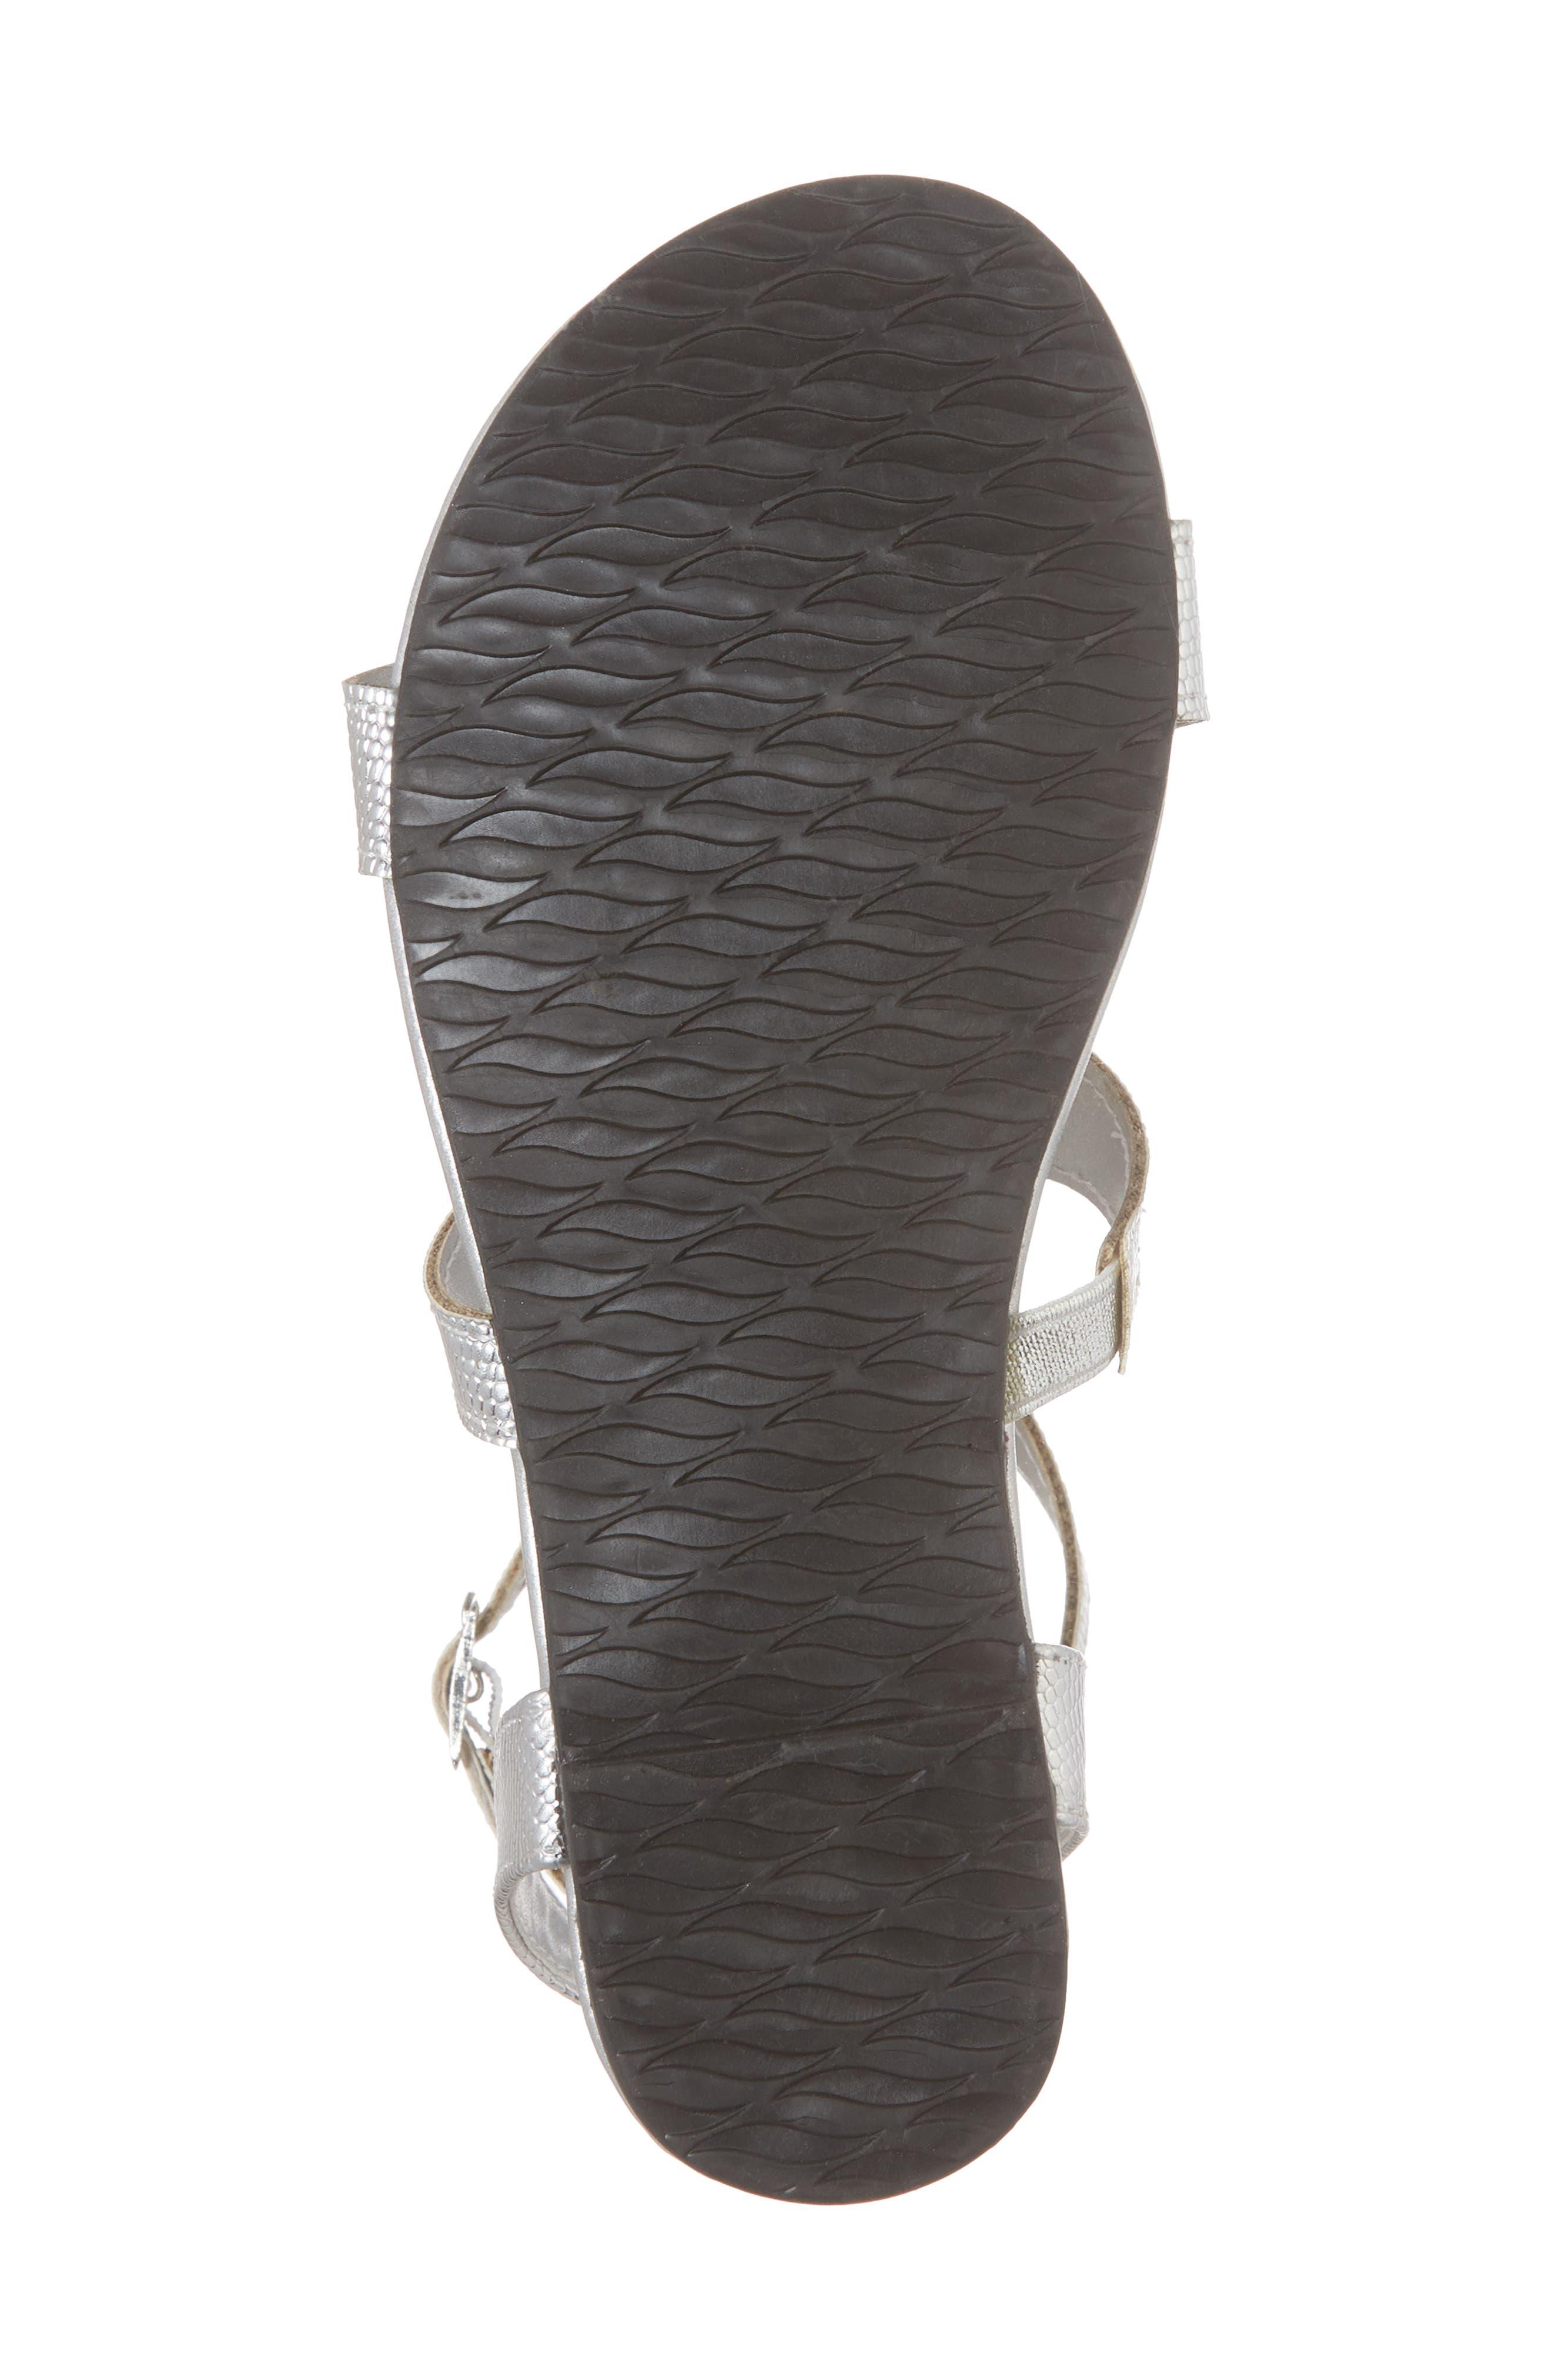 Reaction Kenneth Cole Kiera Soul Metallic Gladiator Sandal,                             Alternate thumbnail 6, color,                             Silver